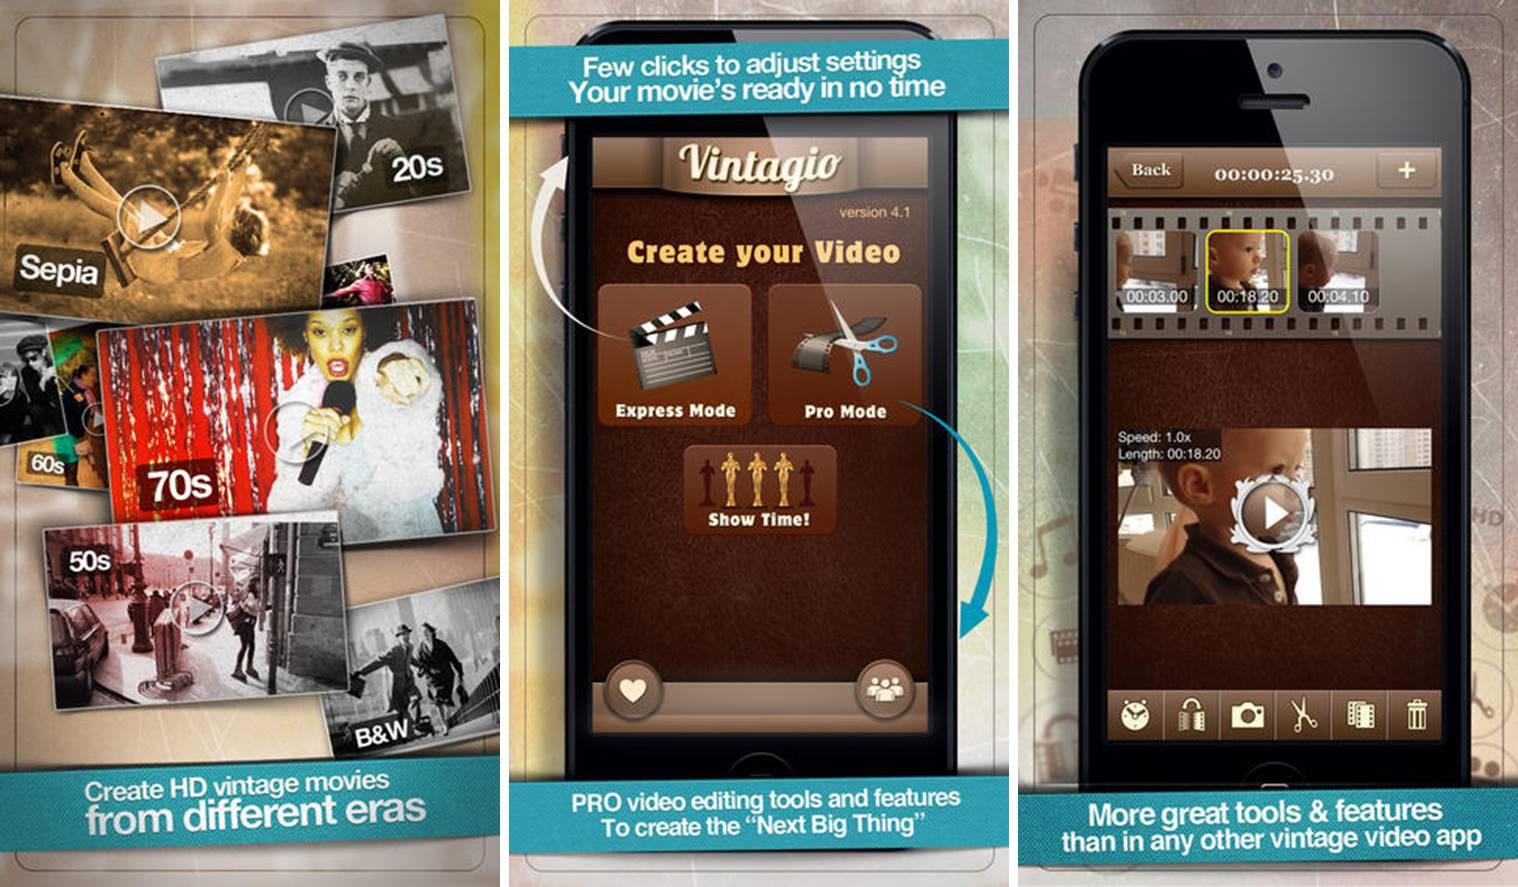 Vintagio video editing app